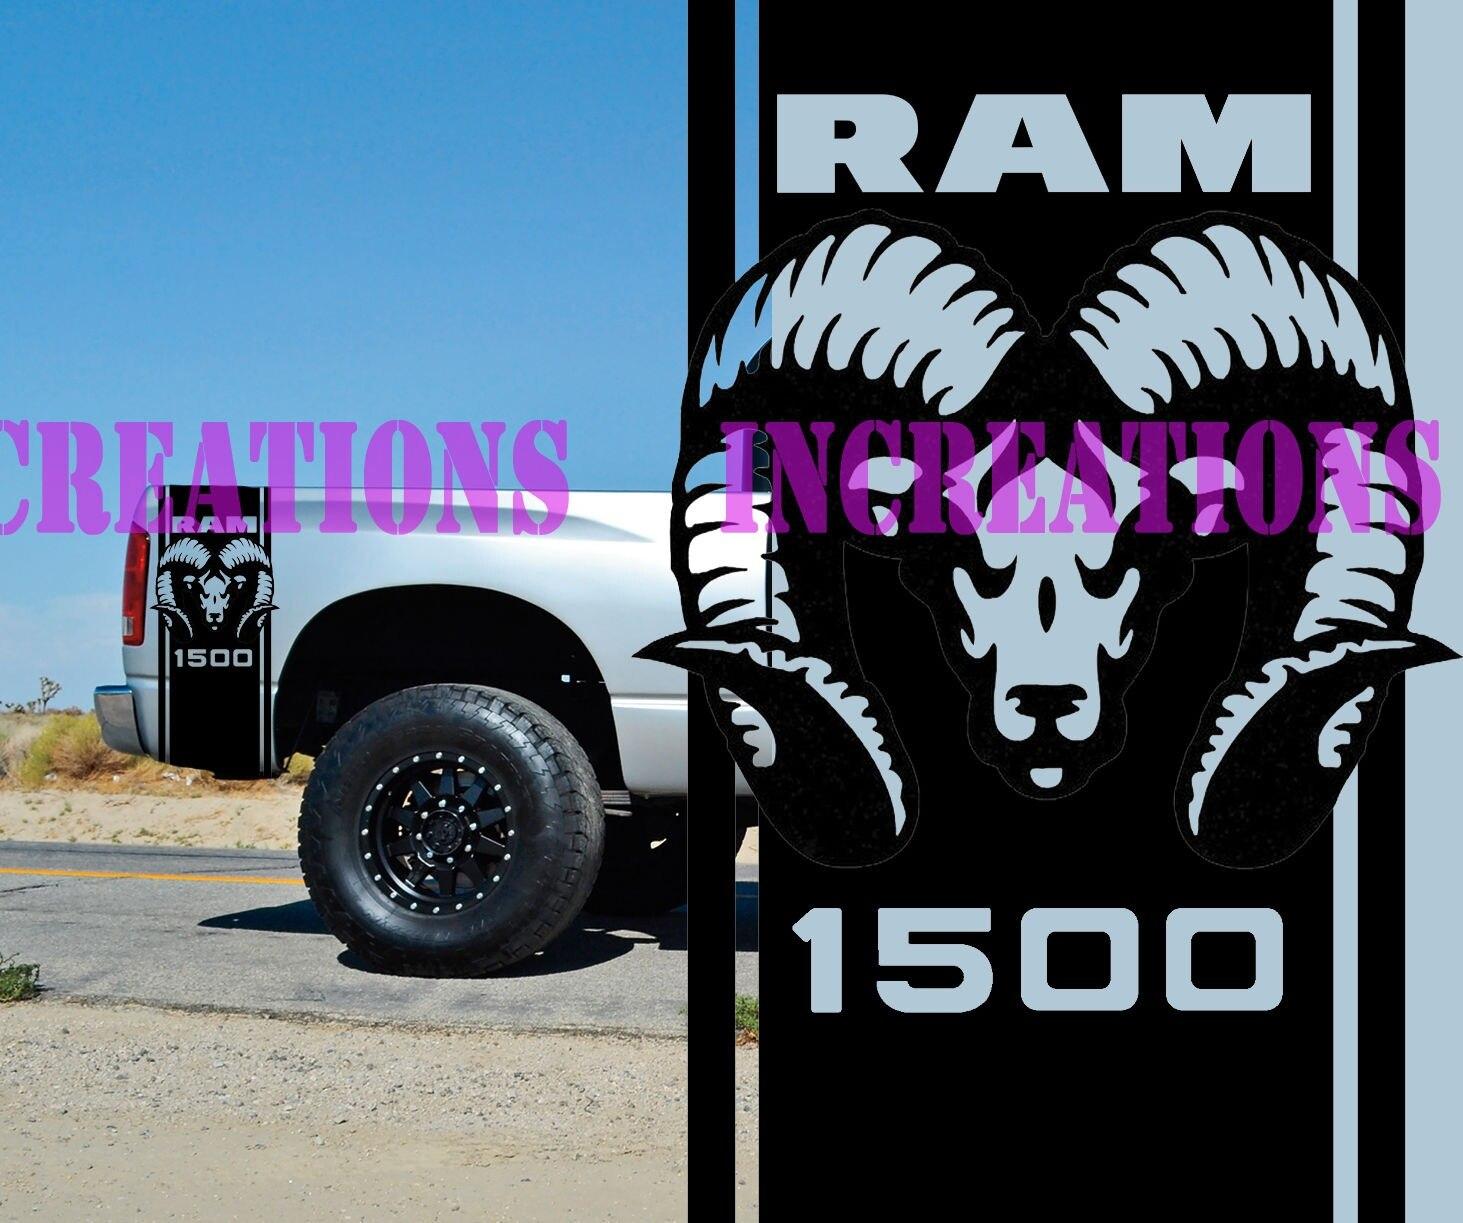 Hemi Sport Dodge Ram Mopar Bed Side Truck Decal Vinyl Stickers Set Of 2 Car Truck Decals Stickers Motors